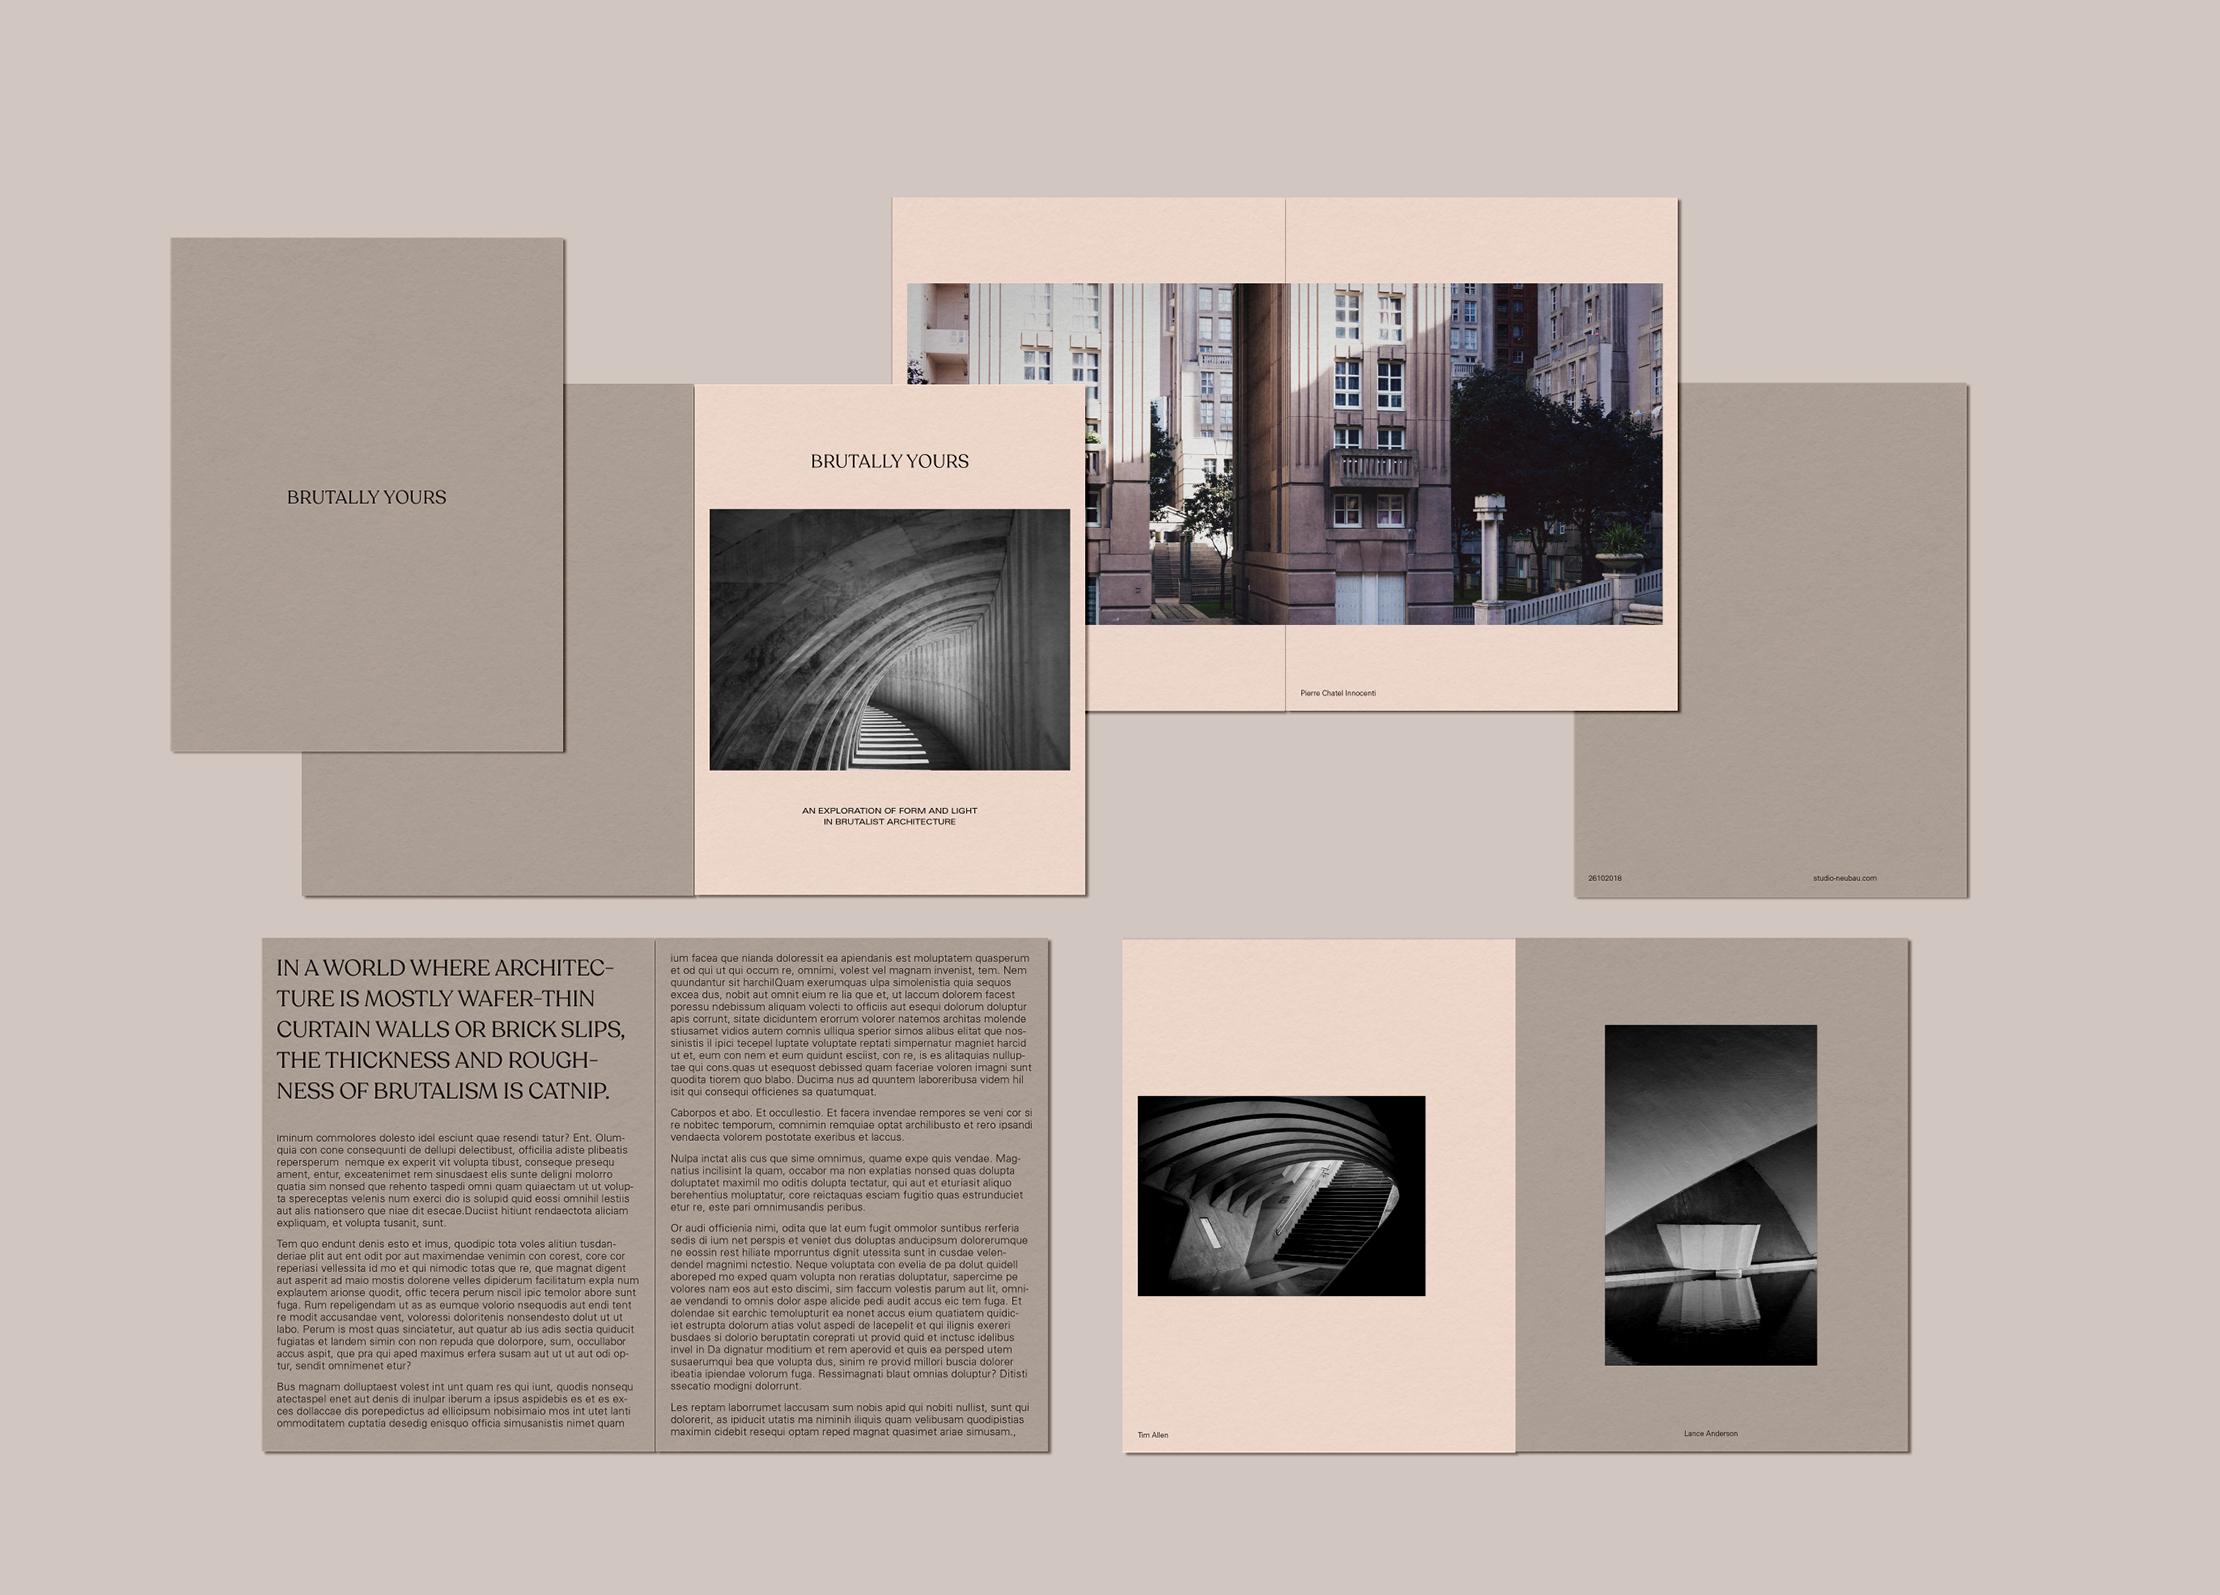 Concept design for book on brutalist architecture